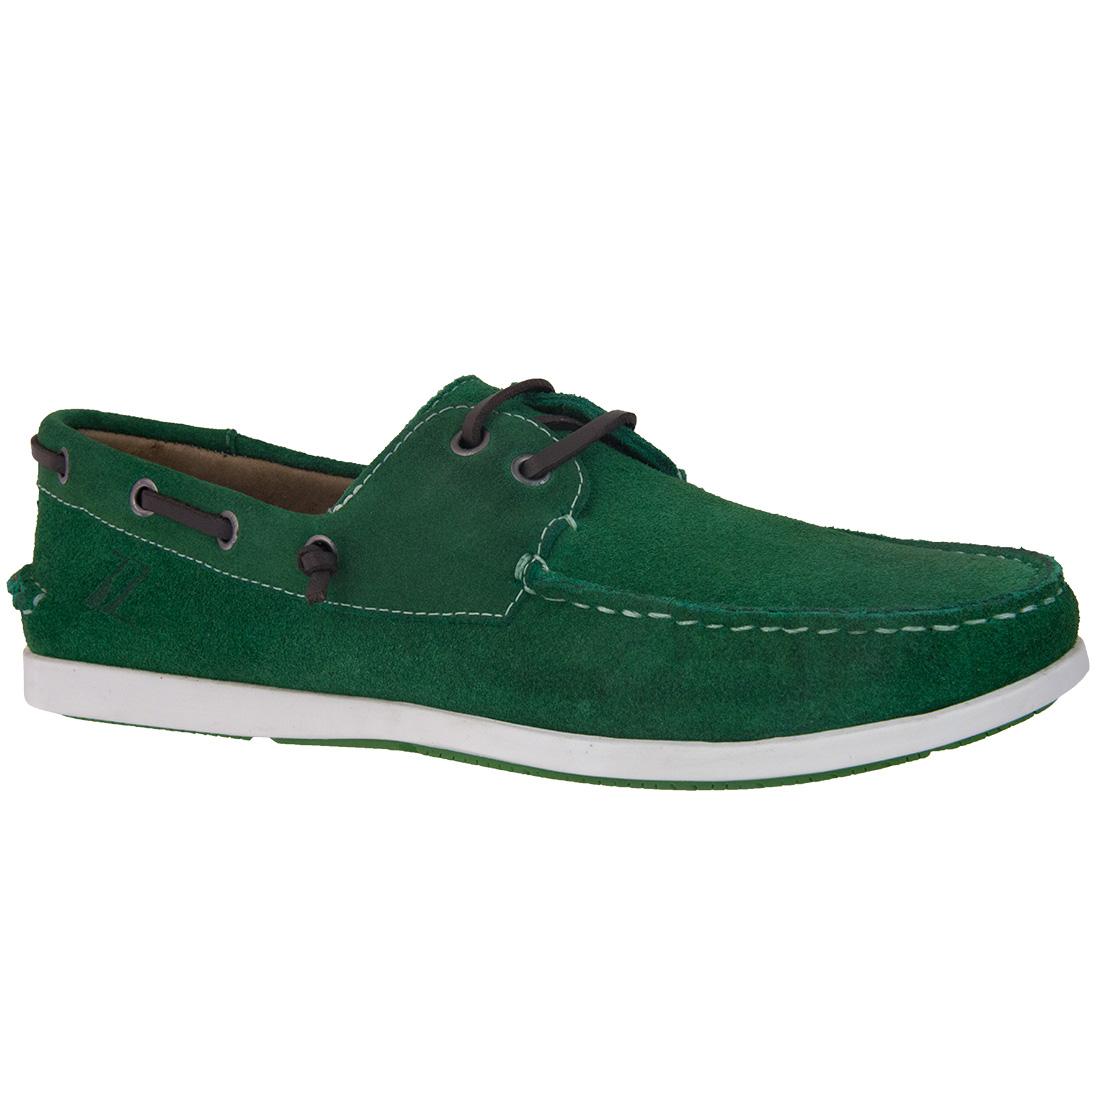 Dockside Masculino Camurça Verde - Rocco Lorenzzo - 4412